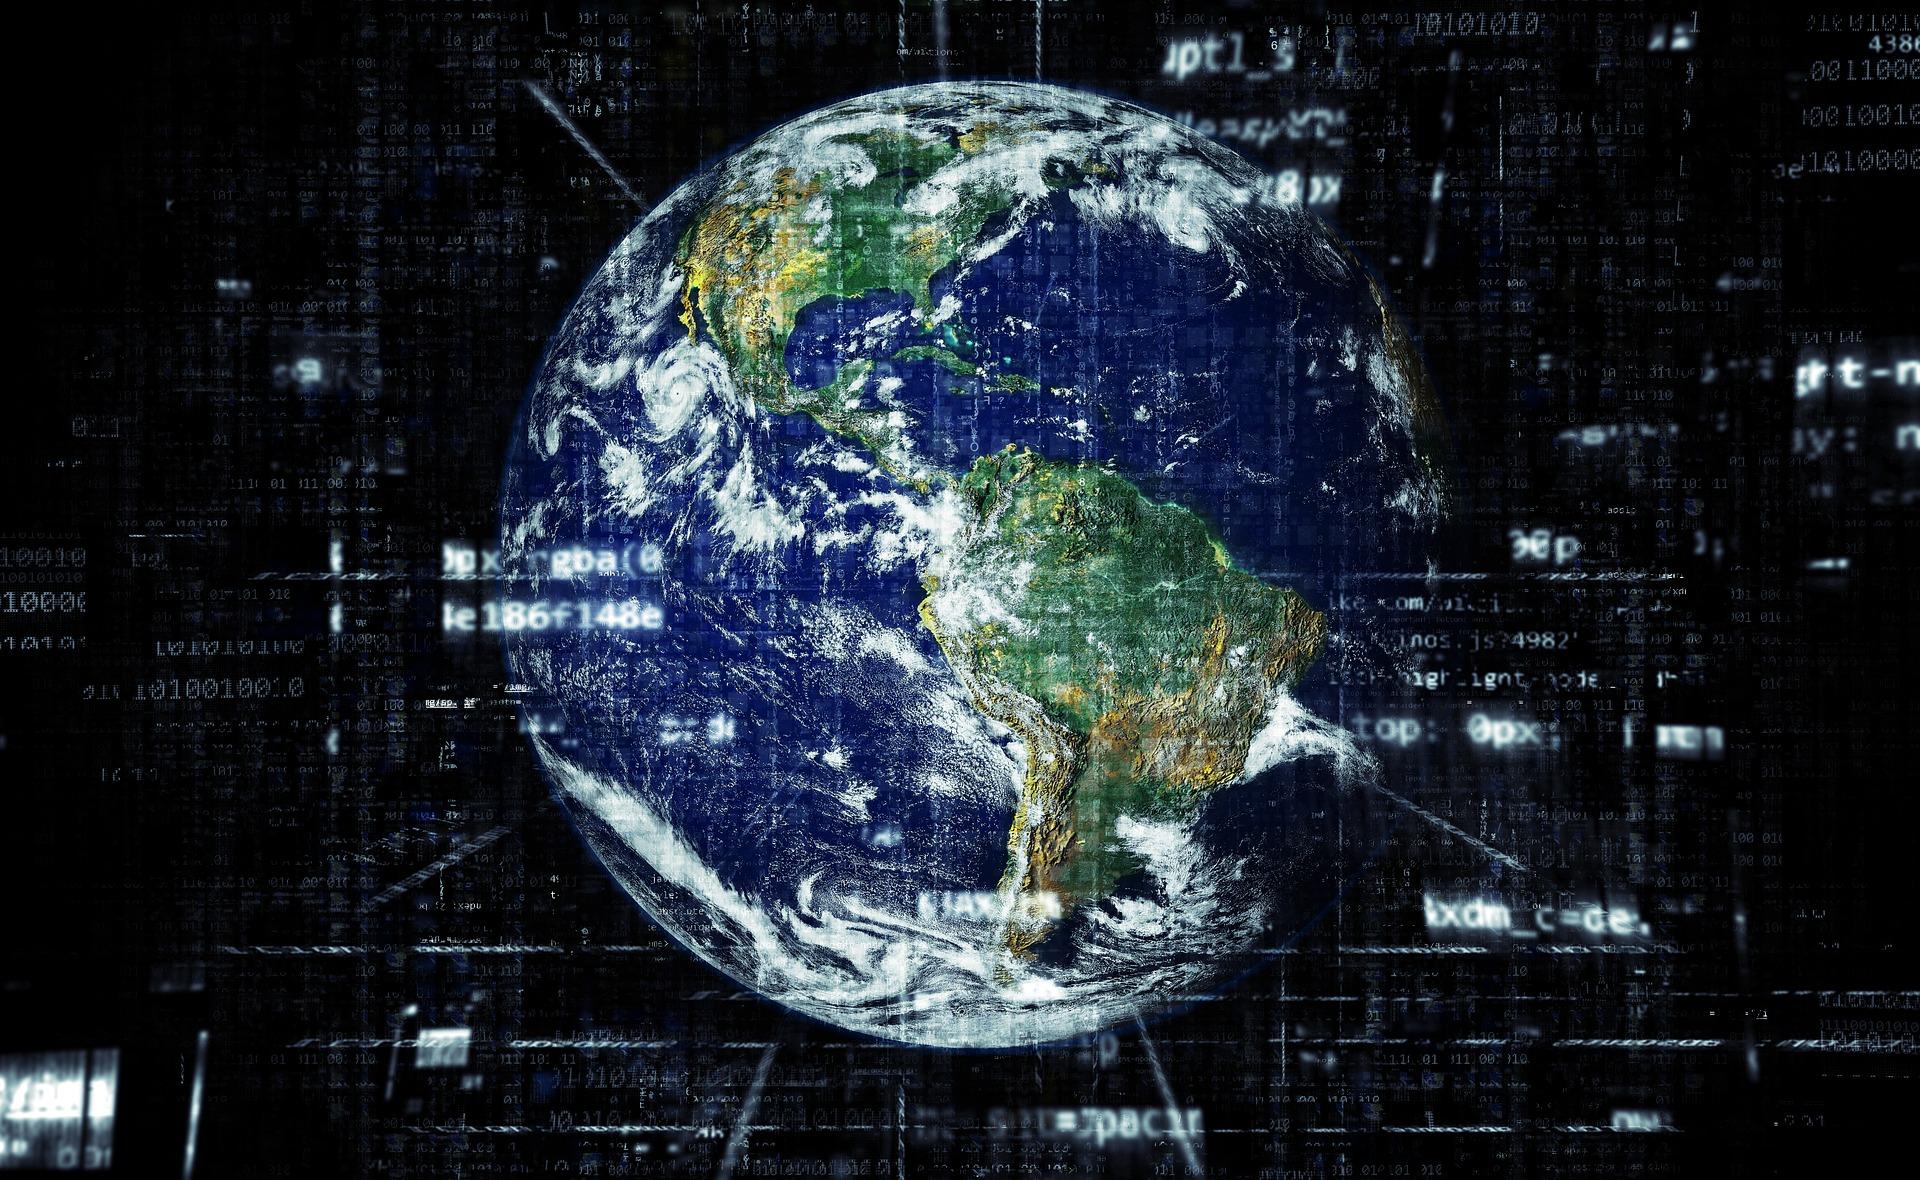 VPN dapat meningkatkan keamanan dan privasi anda selama berselancar di dunia maya